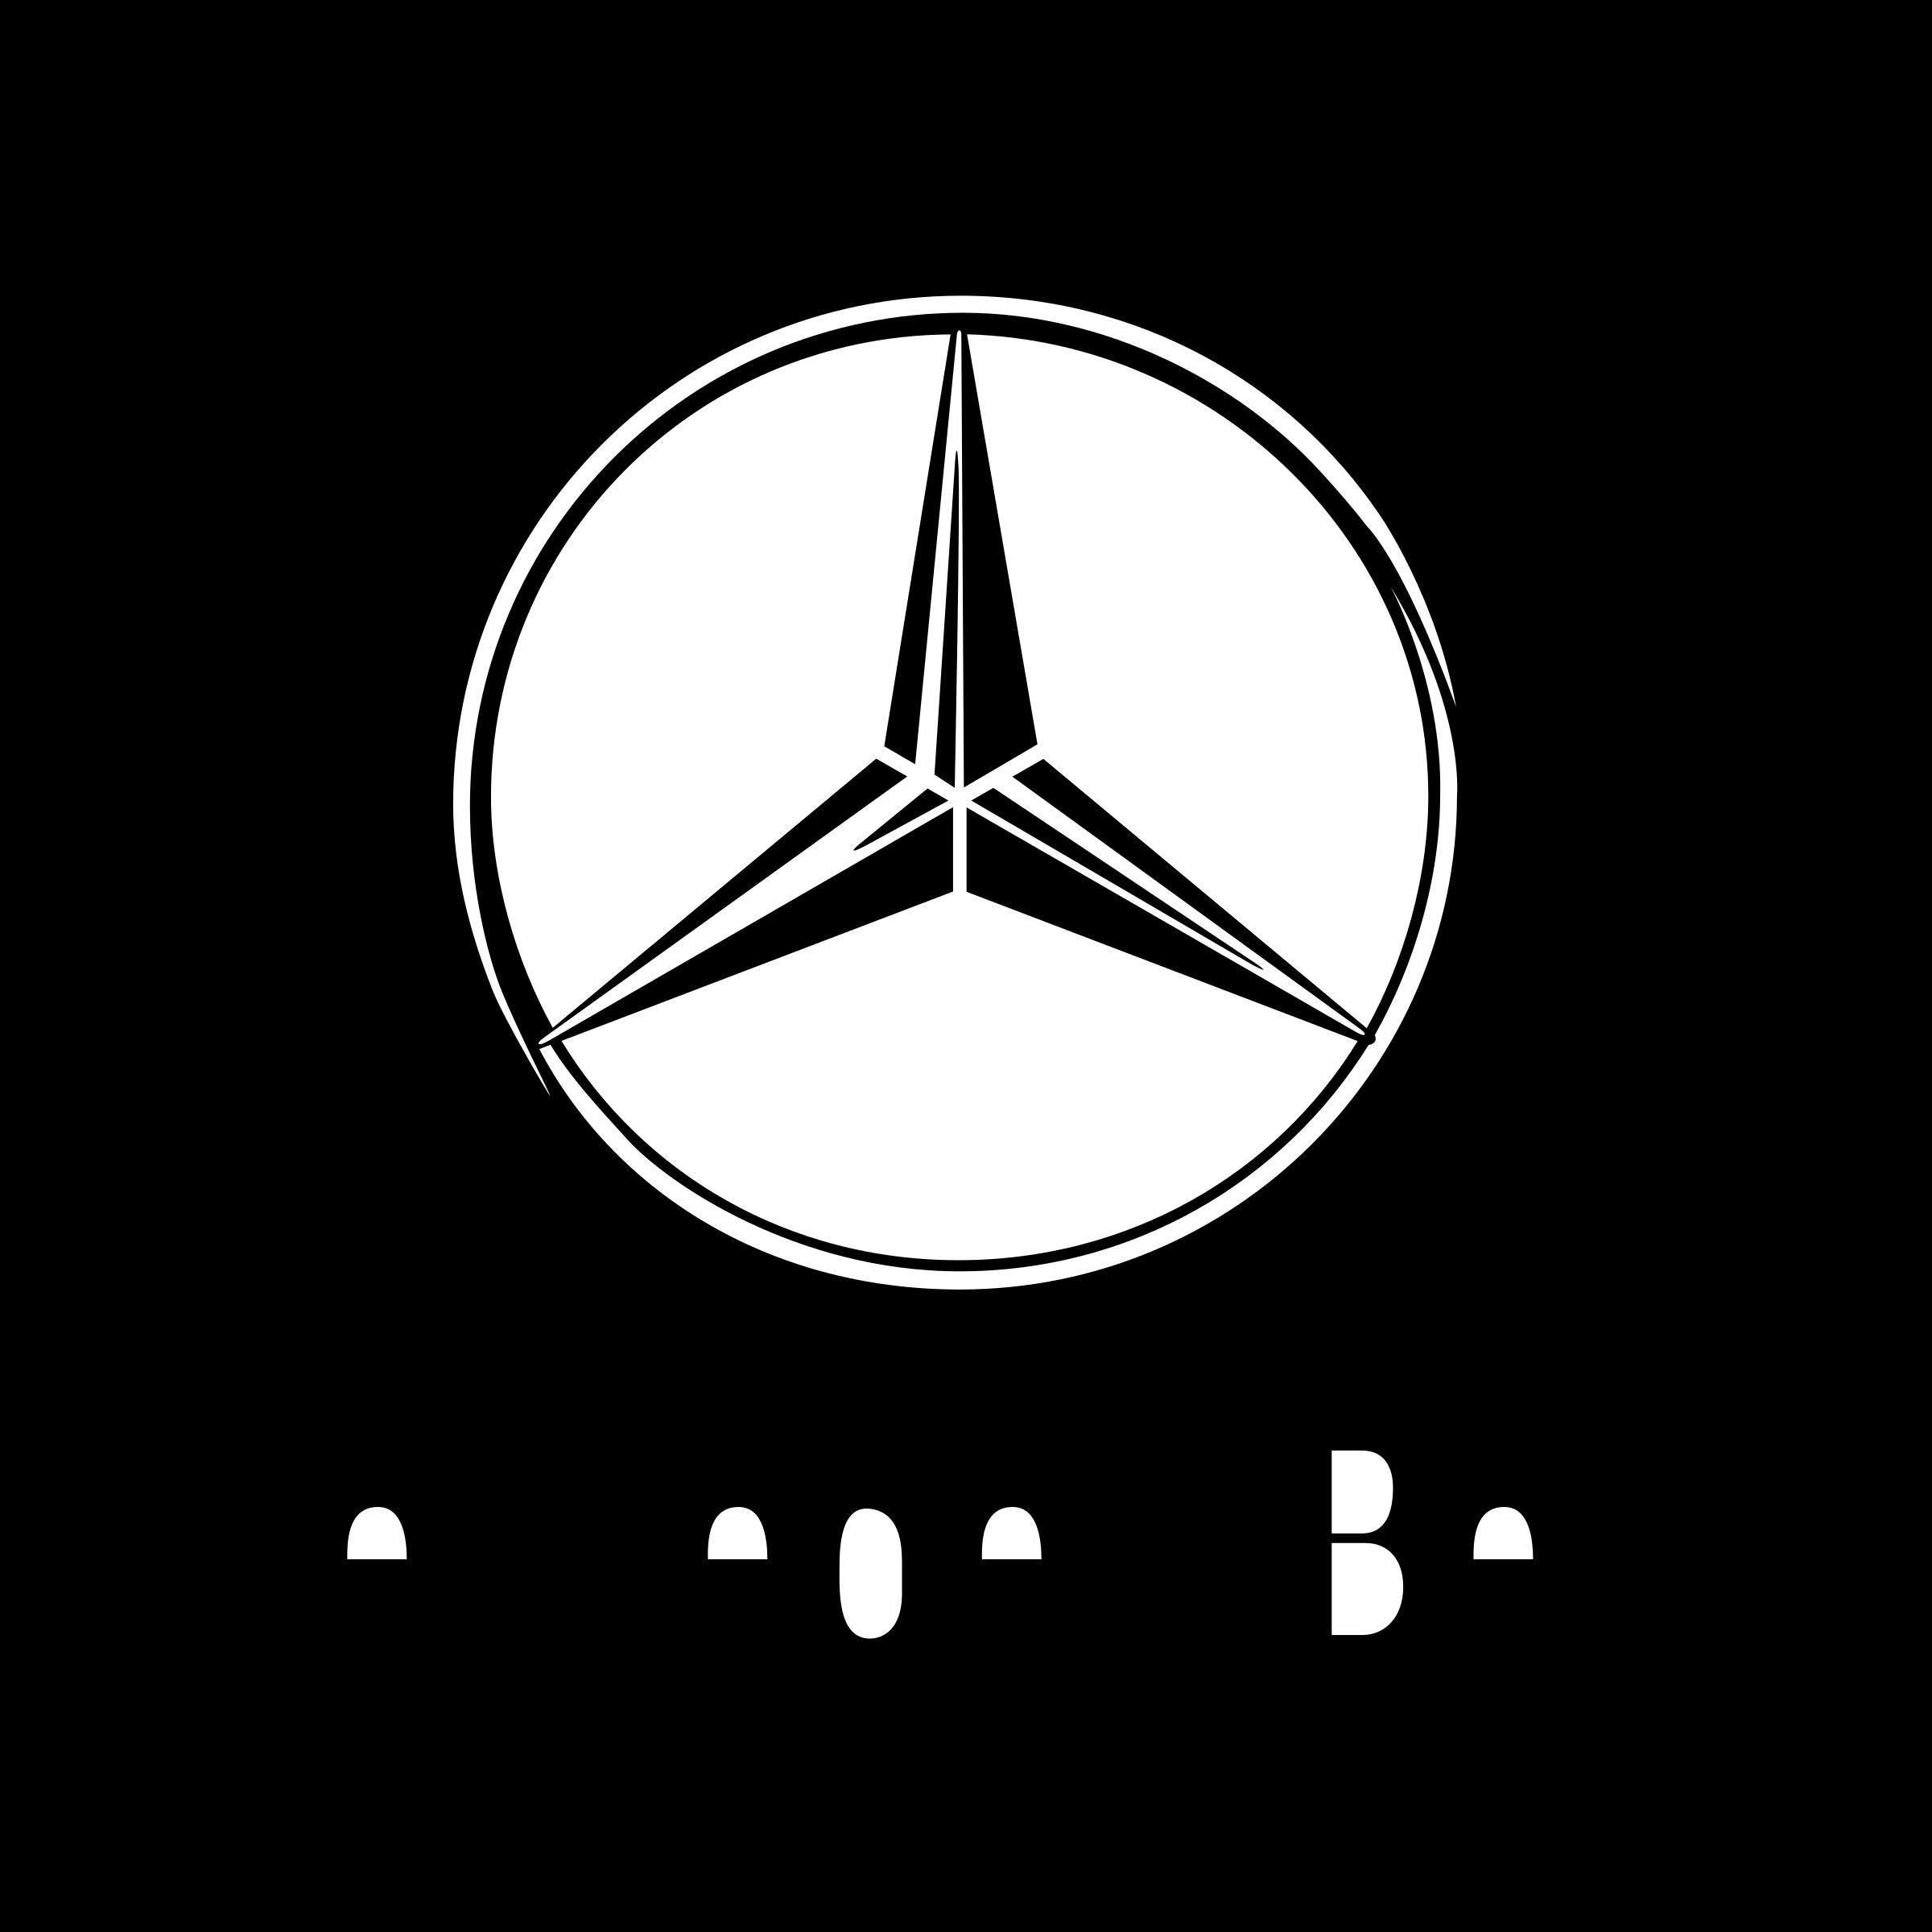 Mercedes Benz Logo PNG Transparent & SVG Vector - Freebie Supply